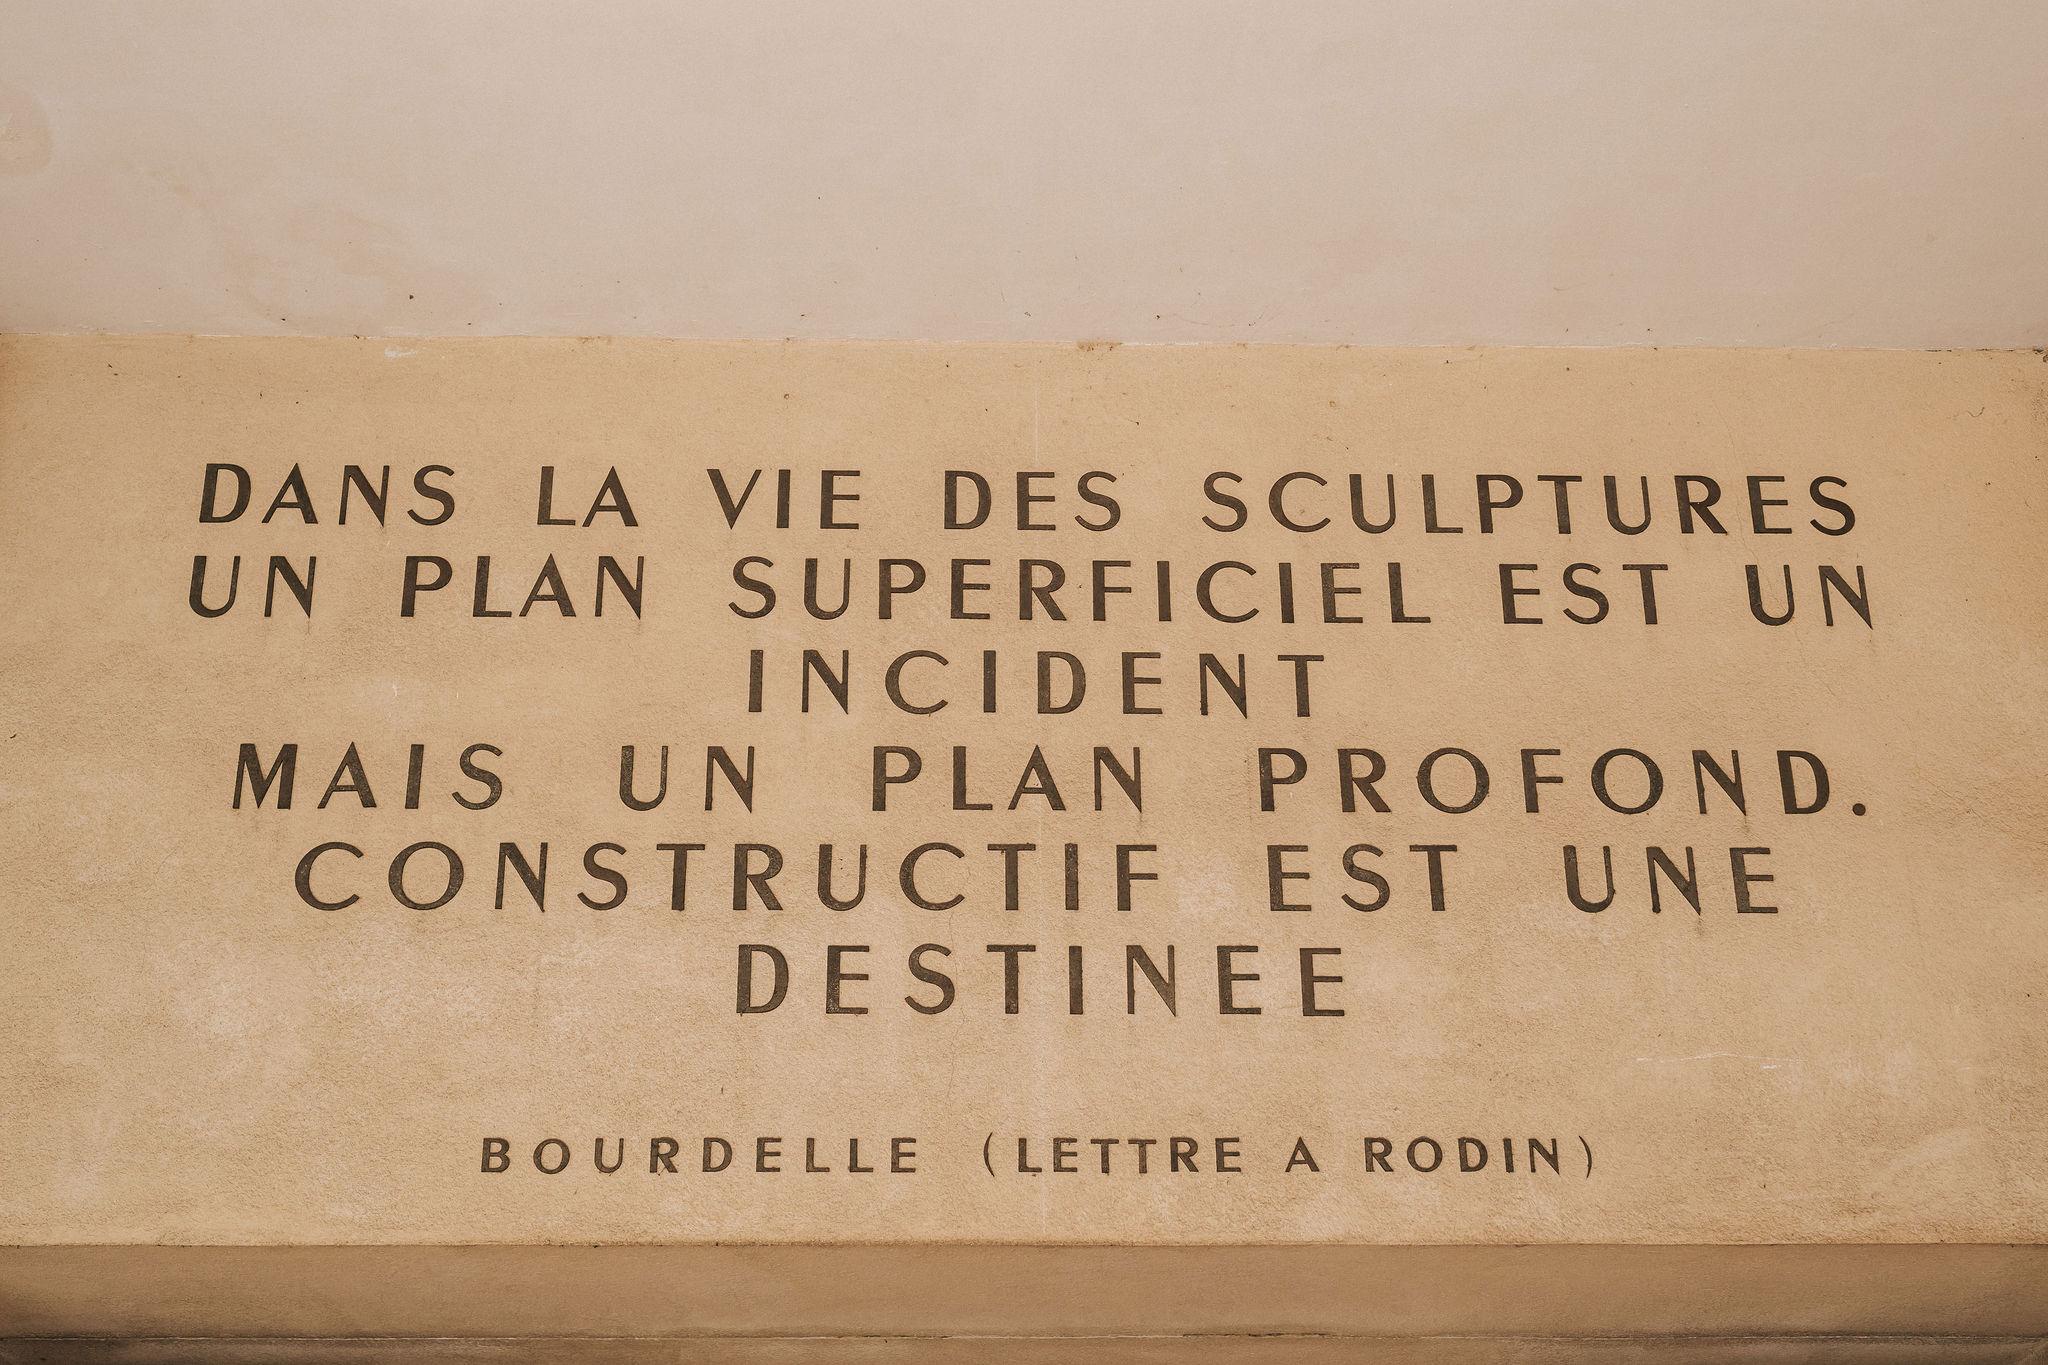 Letter to Rodin by Bourdelle iheartparisfr.jpg